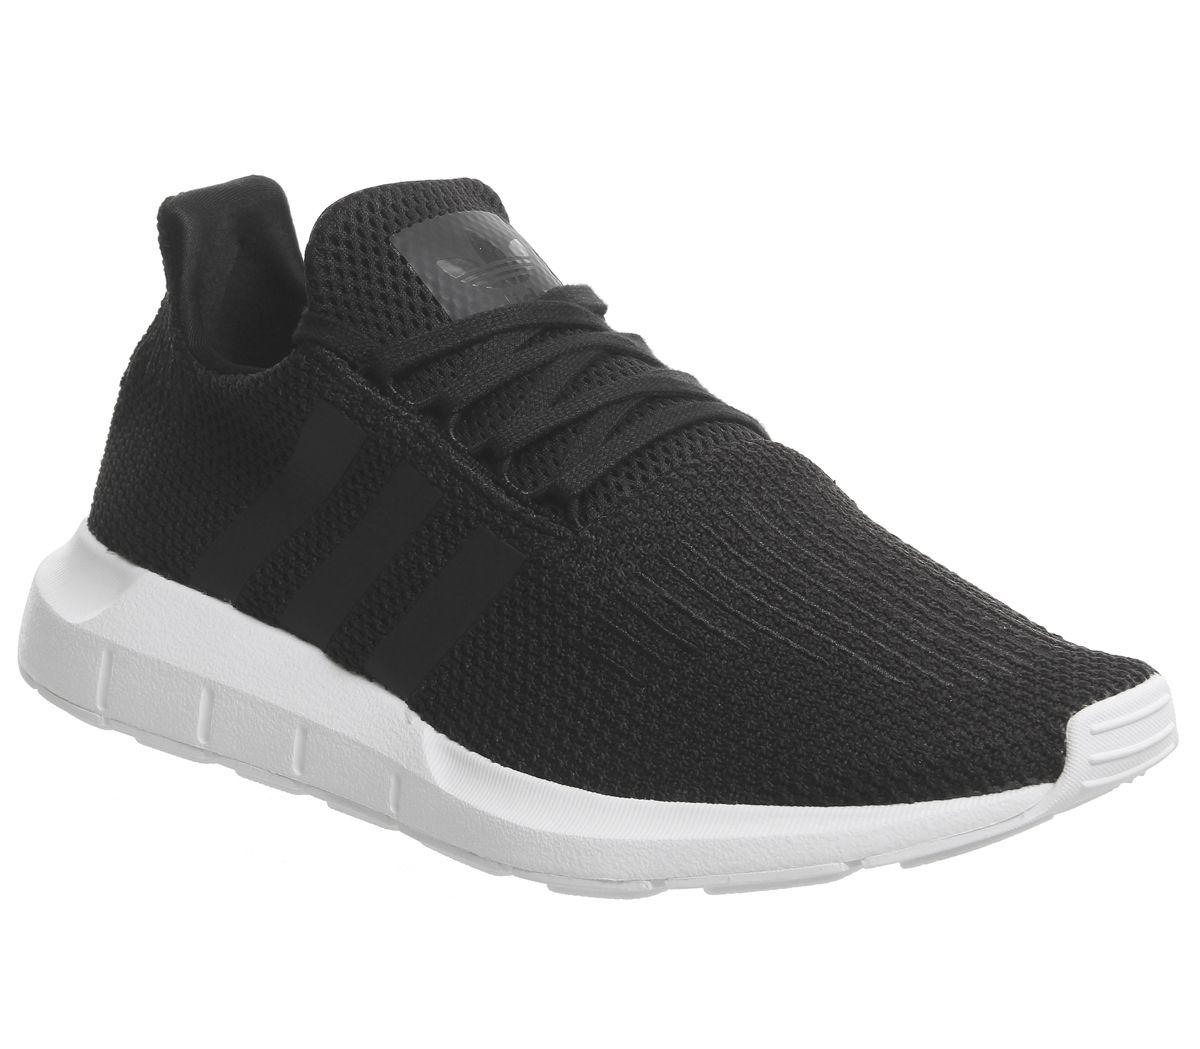 8a1ed9e03 adidas Swift Run Core Black White - Unisex Sports